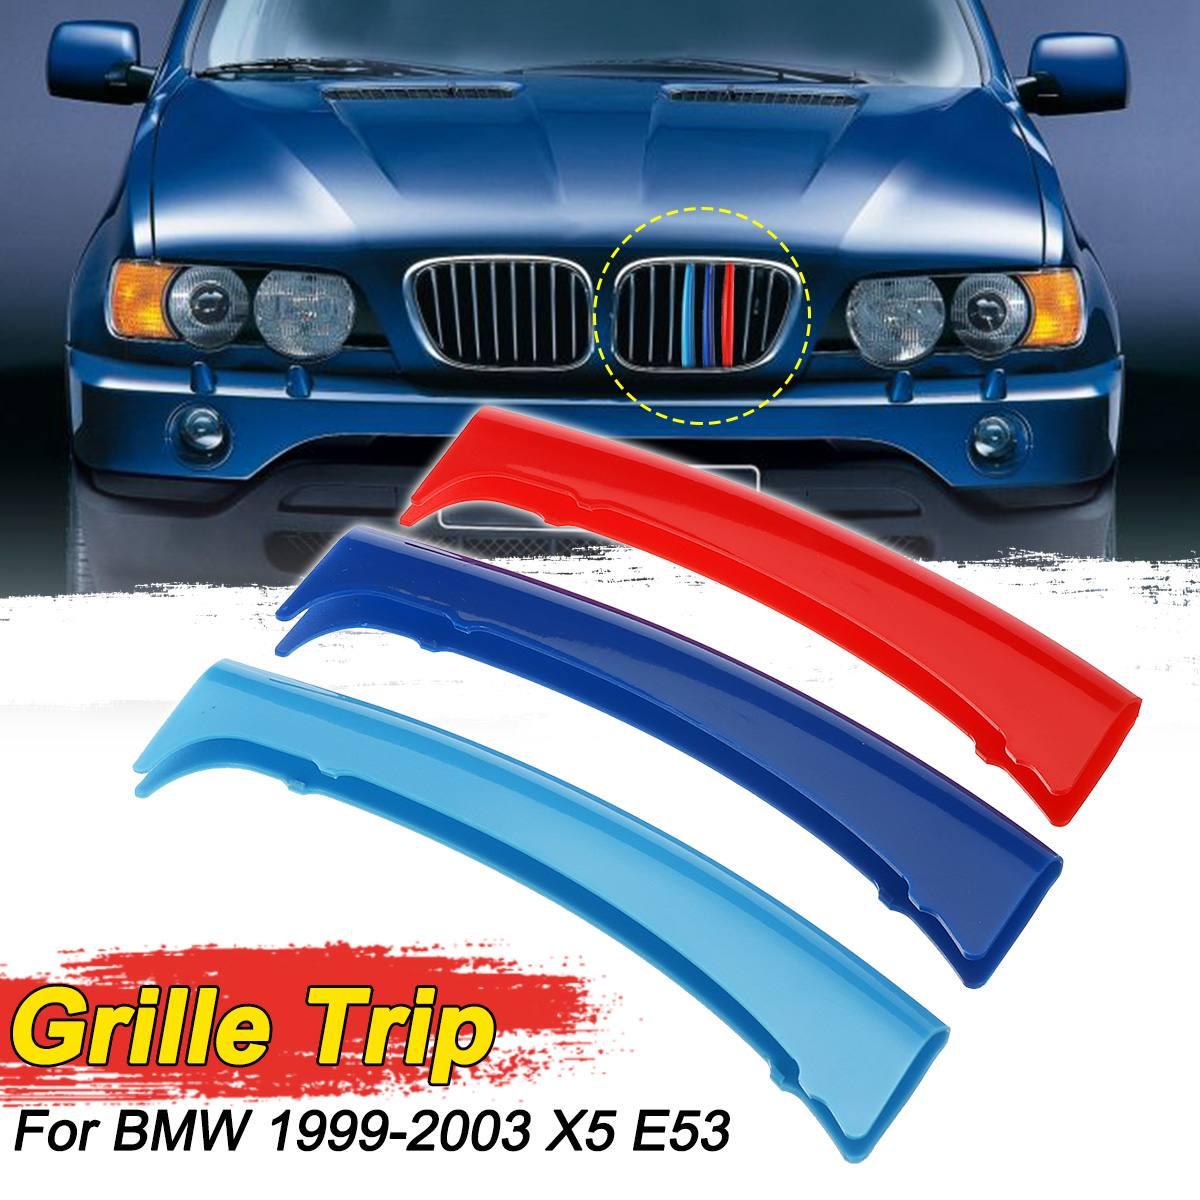 3 Colors Front Kidney Grill Grille Cover Clip Trim M-Color  For BMW X5 E53 1999-2003 8 Poles Grille